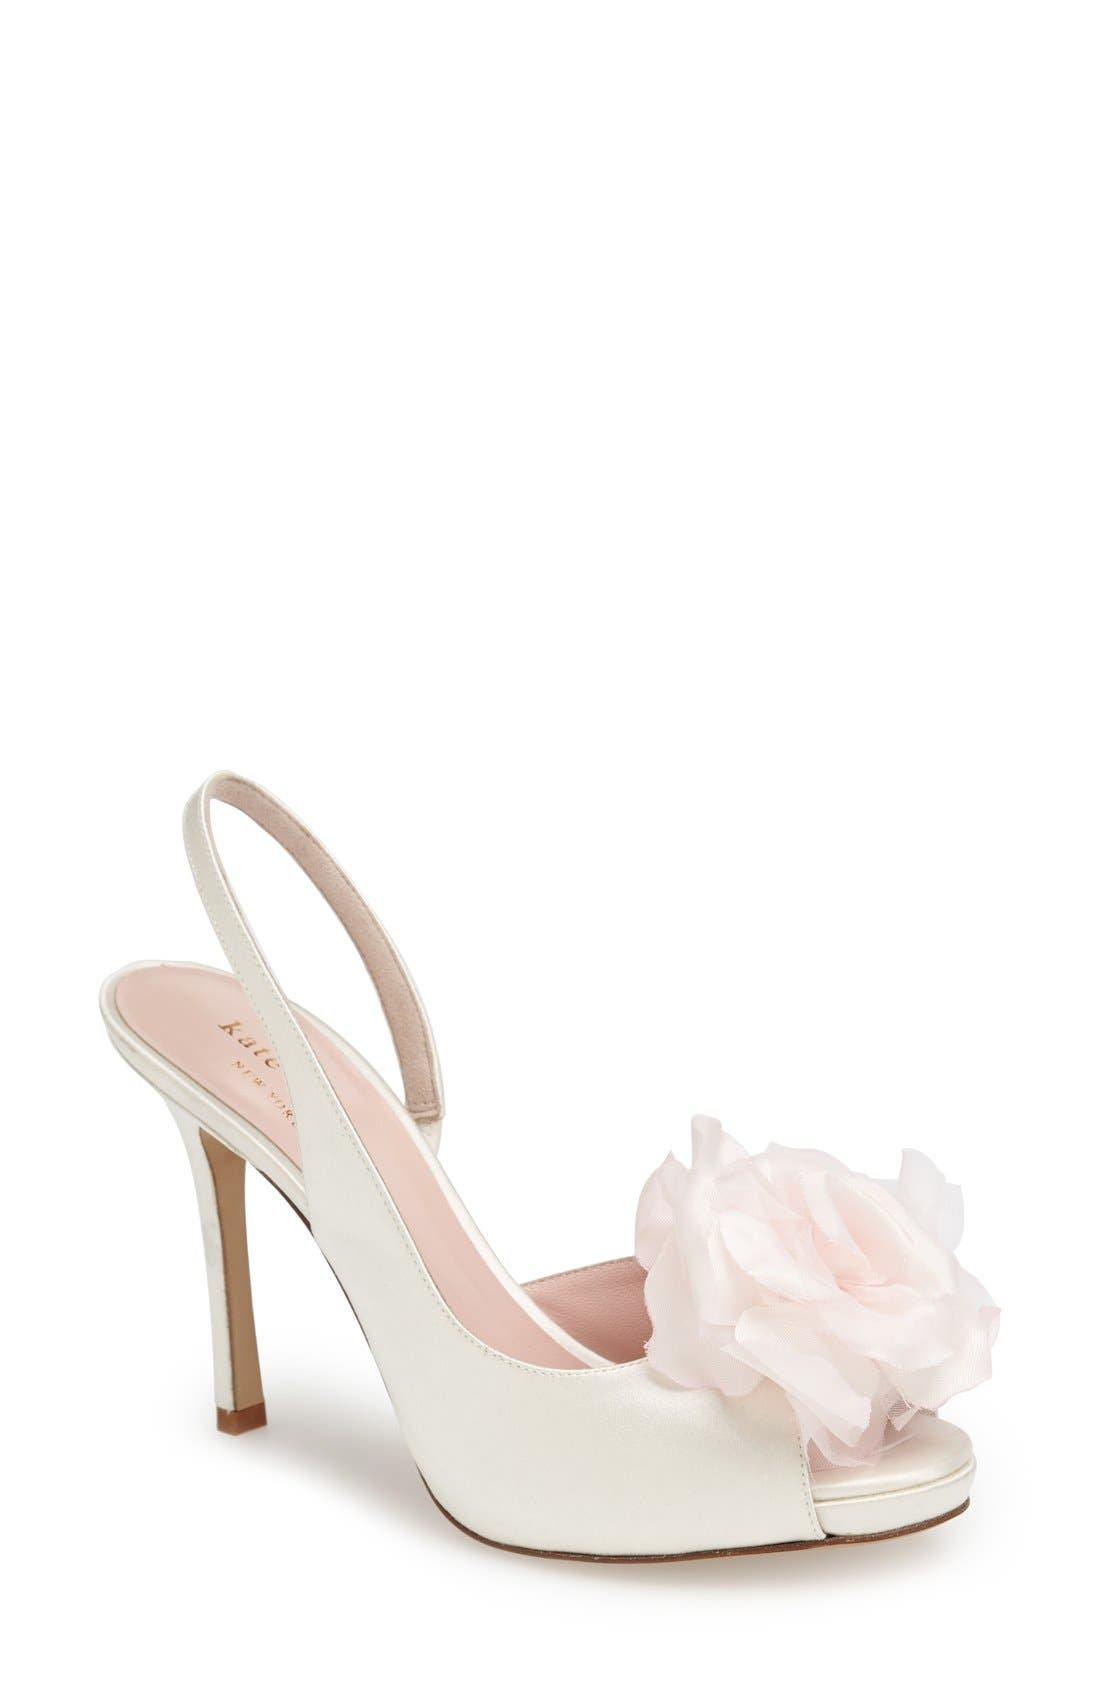 Main Image - kate spade new york 'camilla' high sandal (Women)